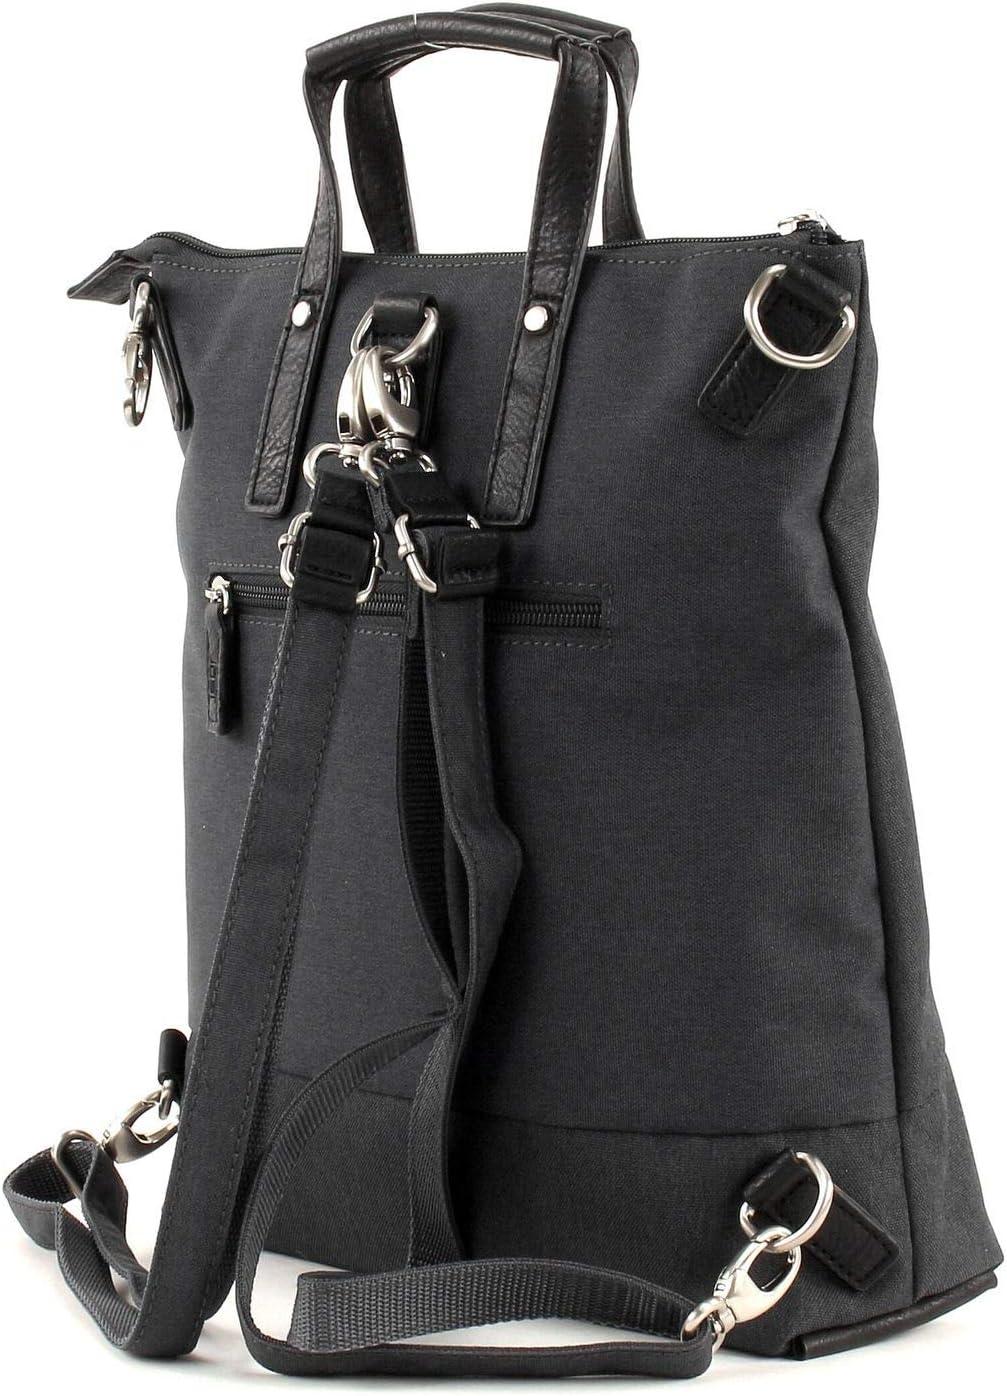 Jost Bergen X-Change 3in1 Bag XS City Sac /à Dos 32 cm